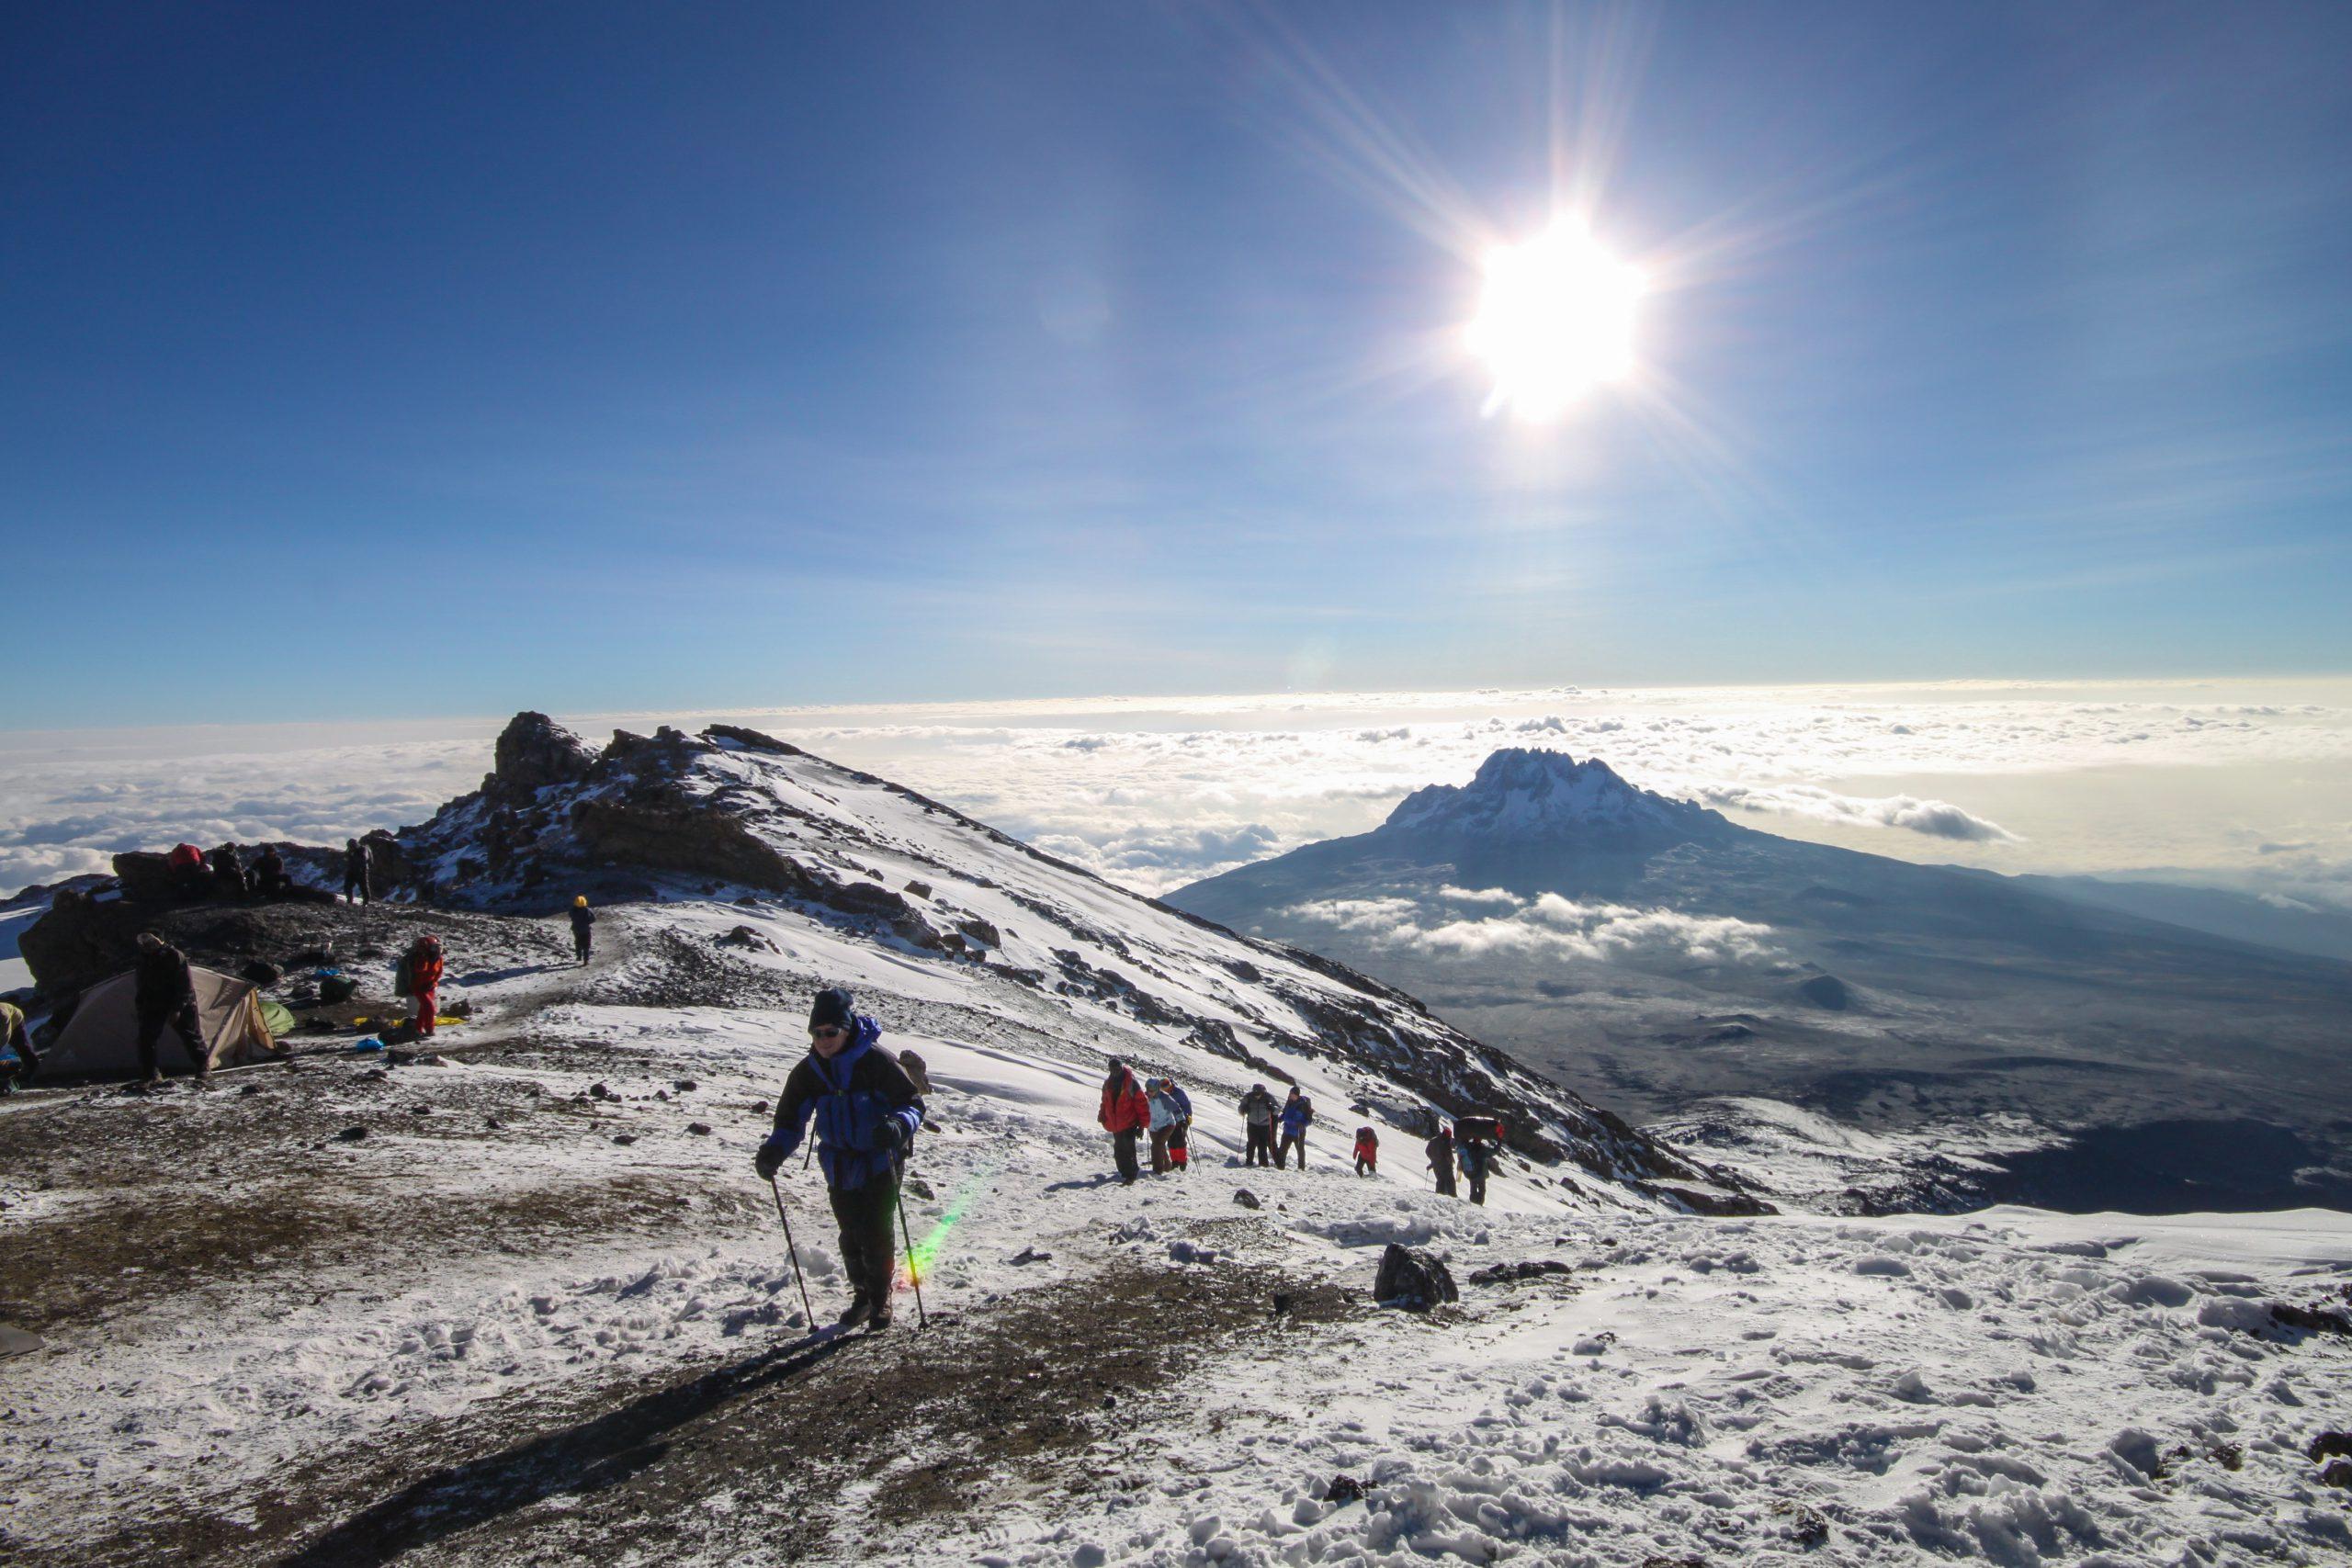 school_expedition_kenya_kilimanjaro_climbing_mountain